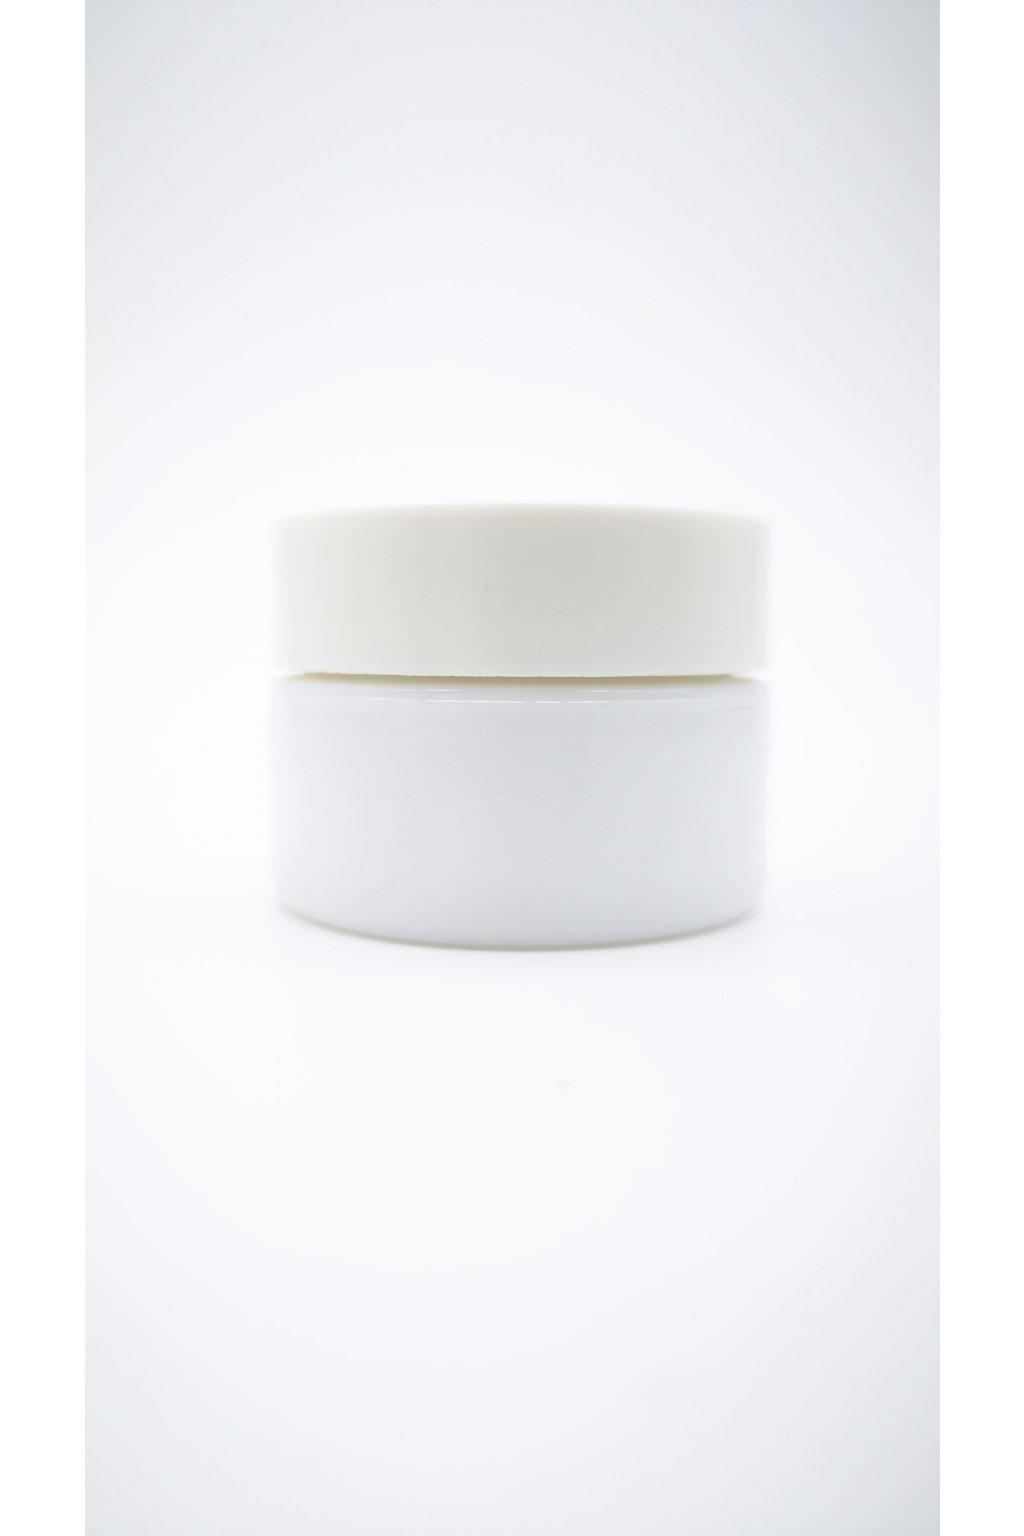 88025 OPC cream forte